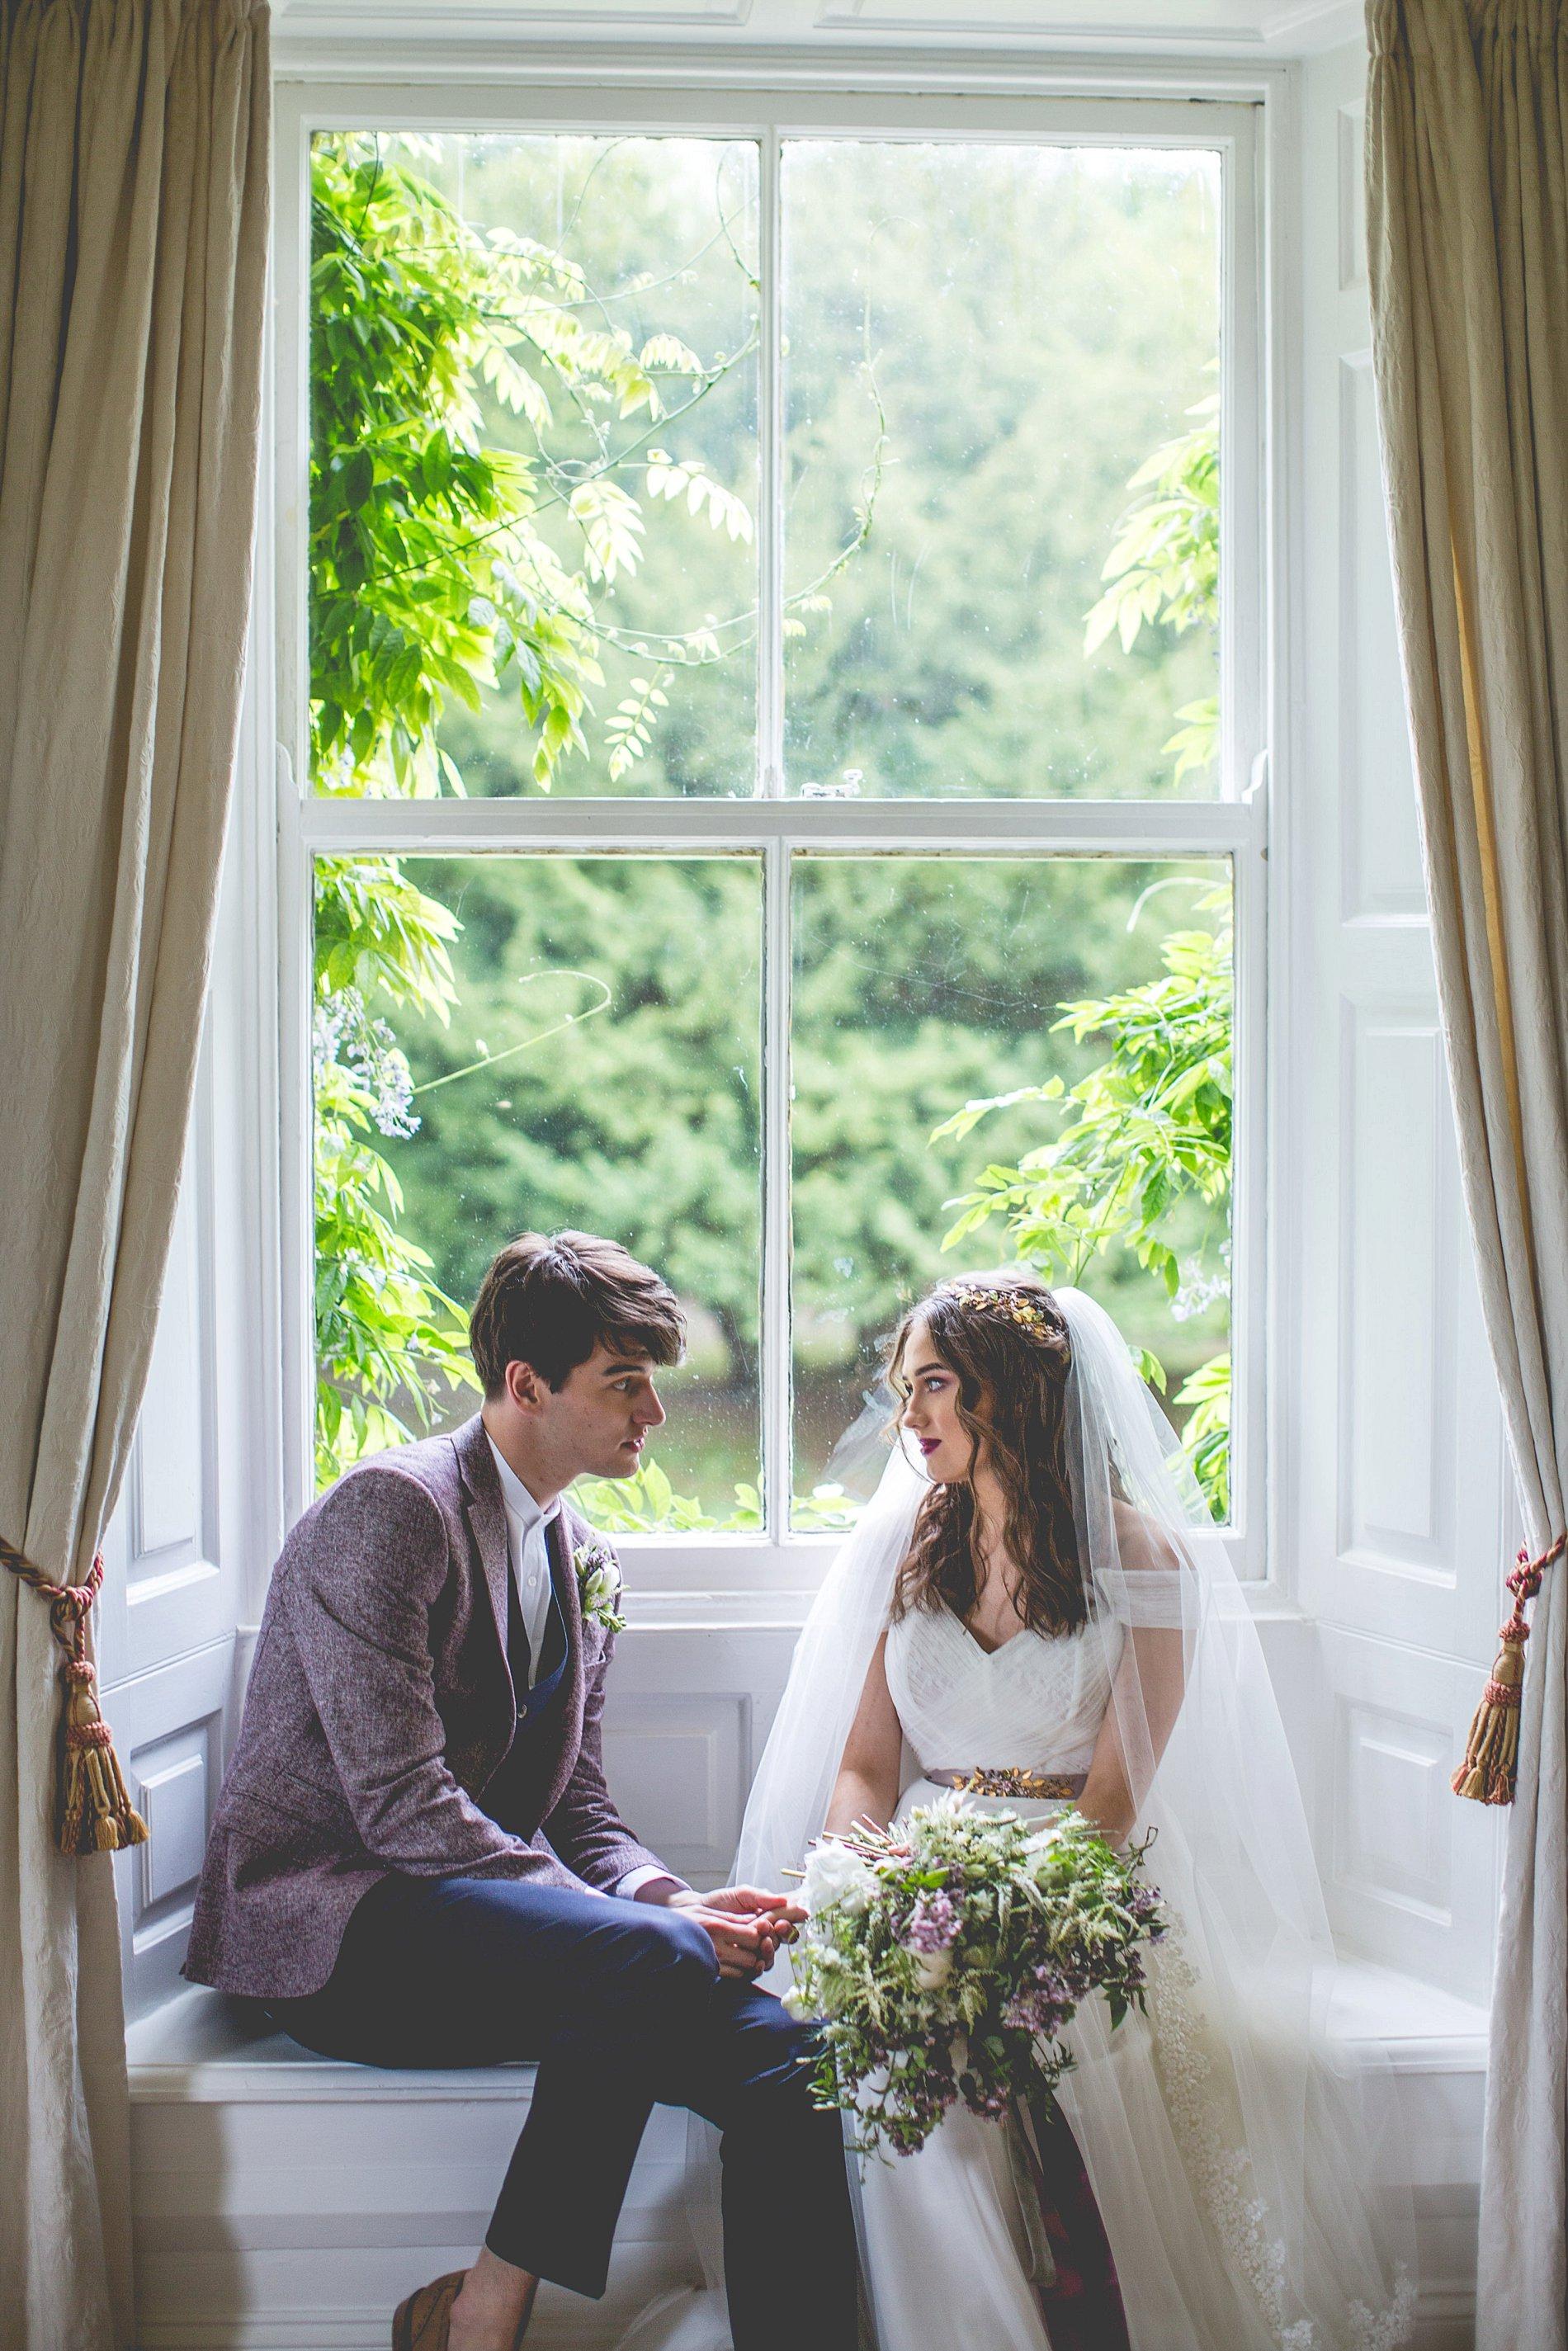 A Styled Bridal Shoot at Eshott Hall (c) Sean Elliott Photography (61)